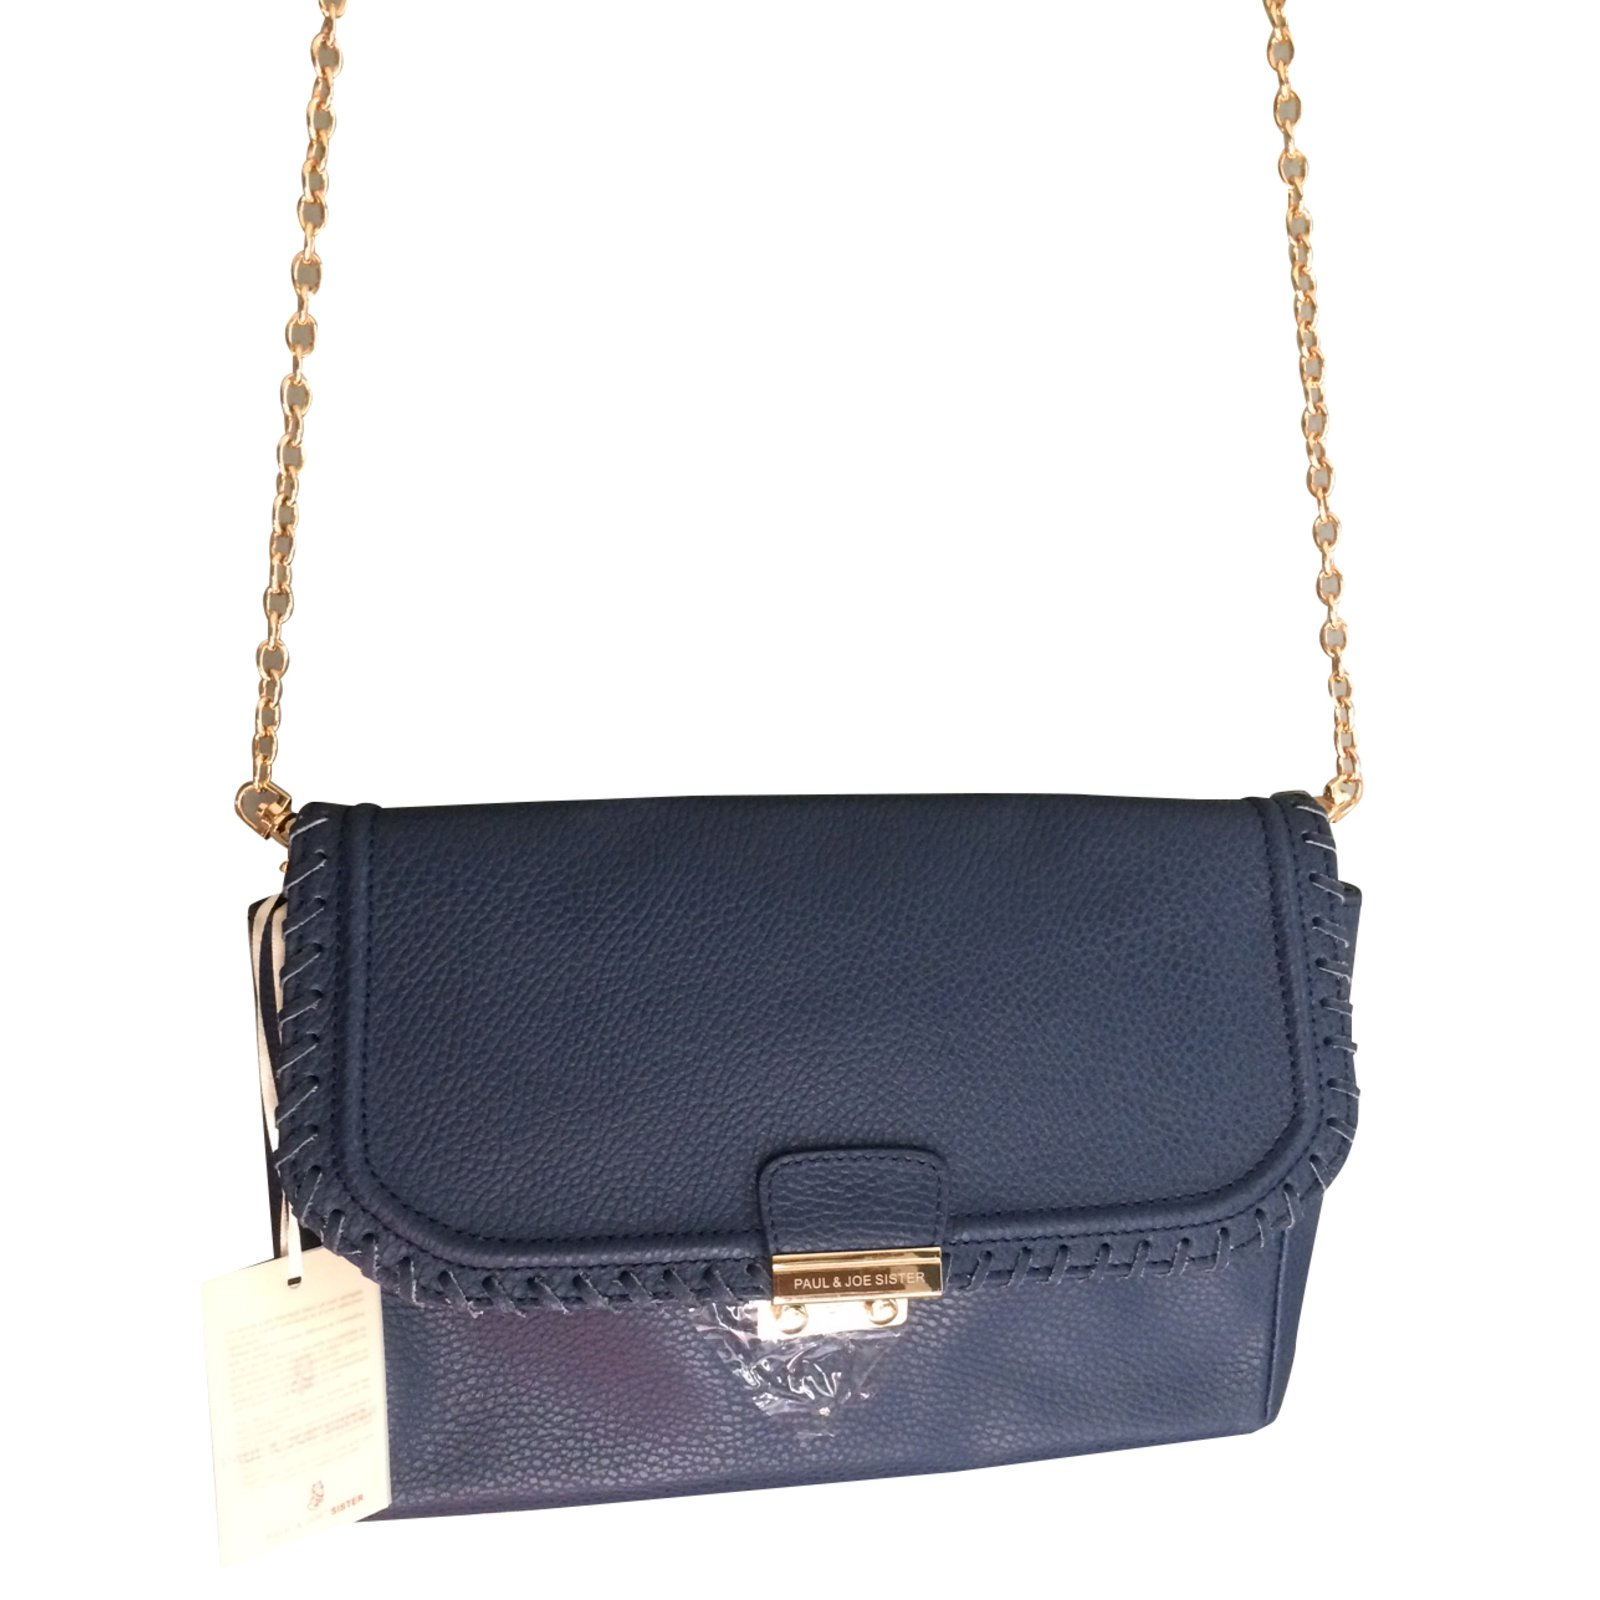 Paul Joe Sister Handbag Handbags Leather Blue Ref 29061